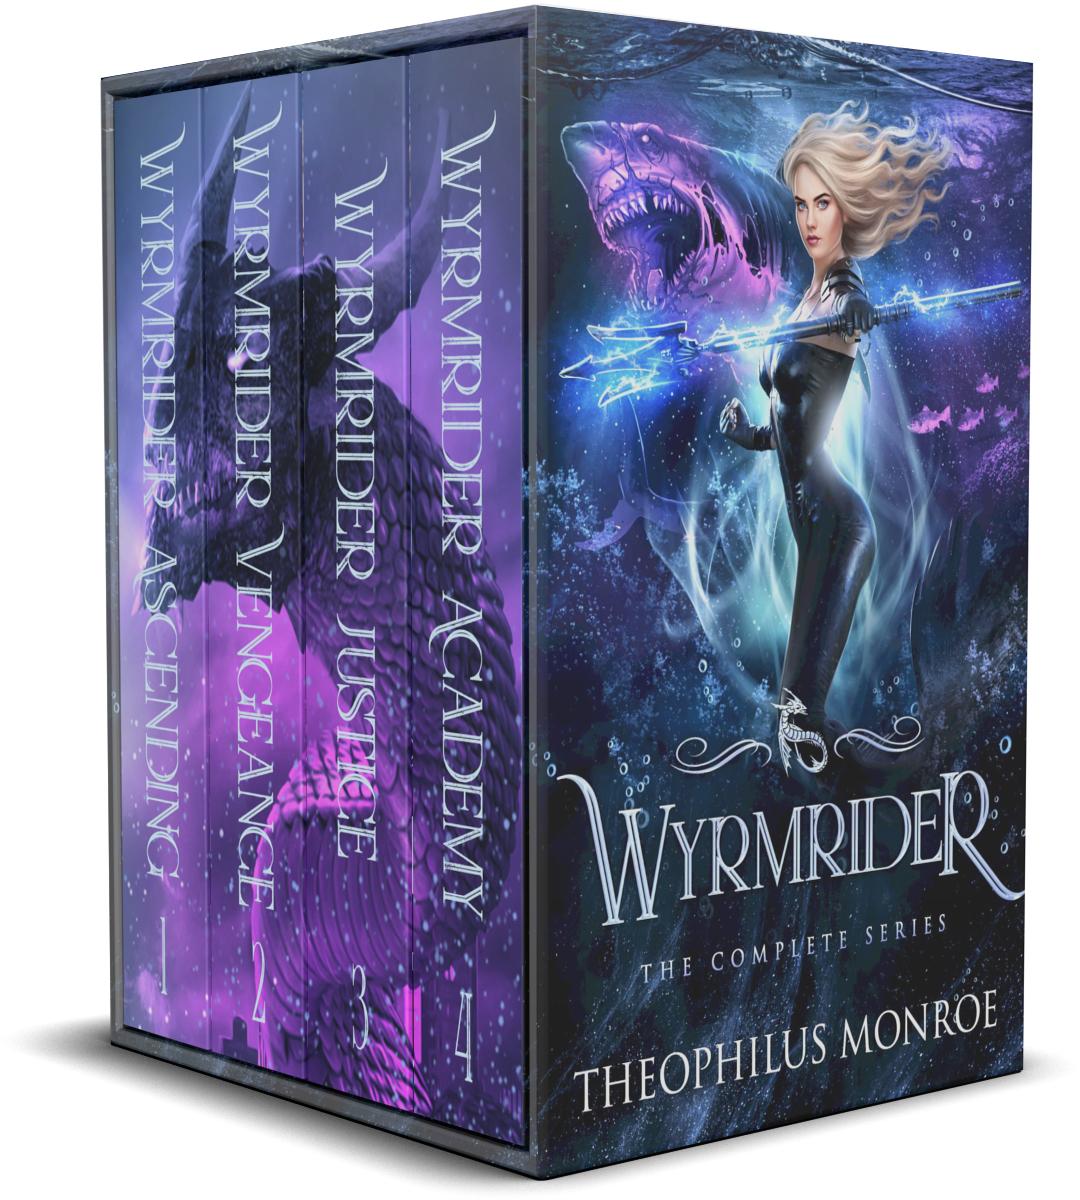 Wyrmrider (Books 1-4)